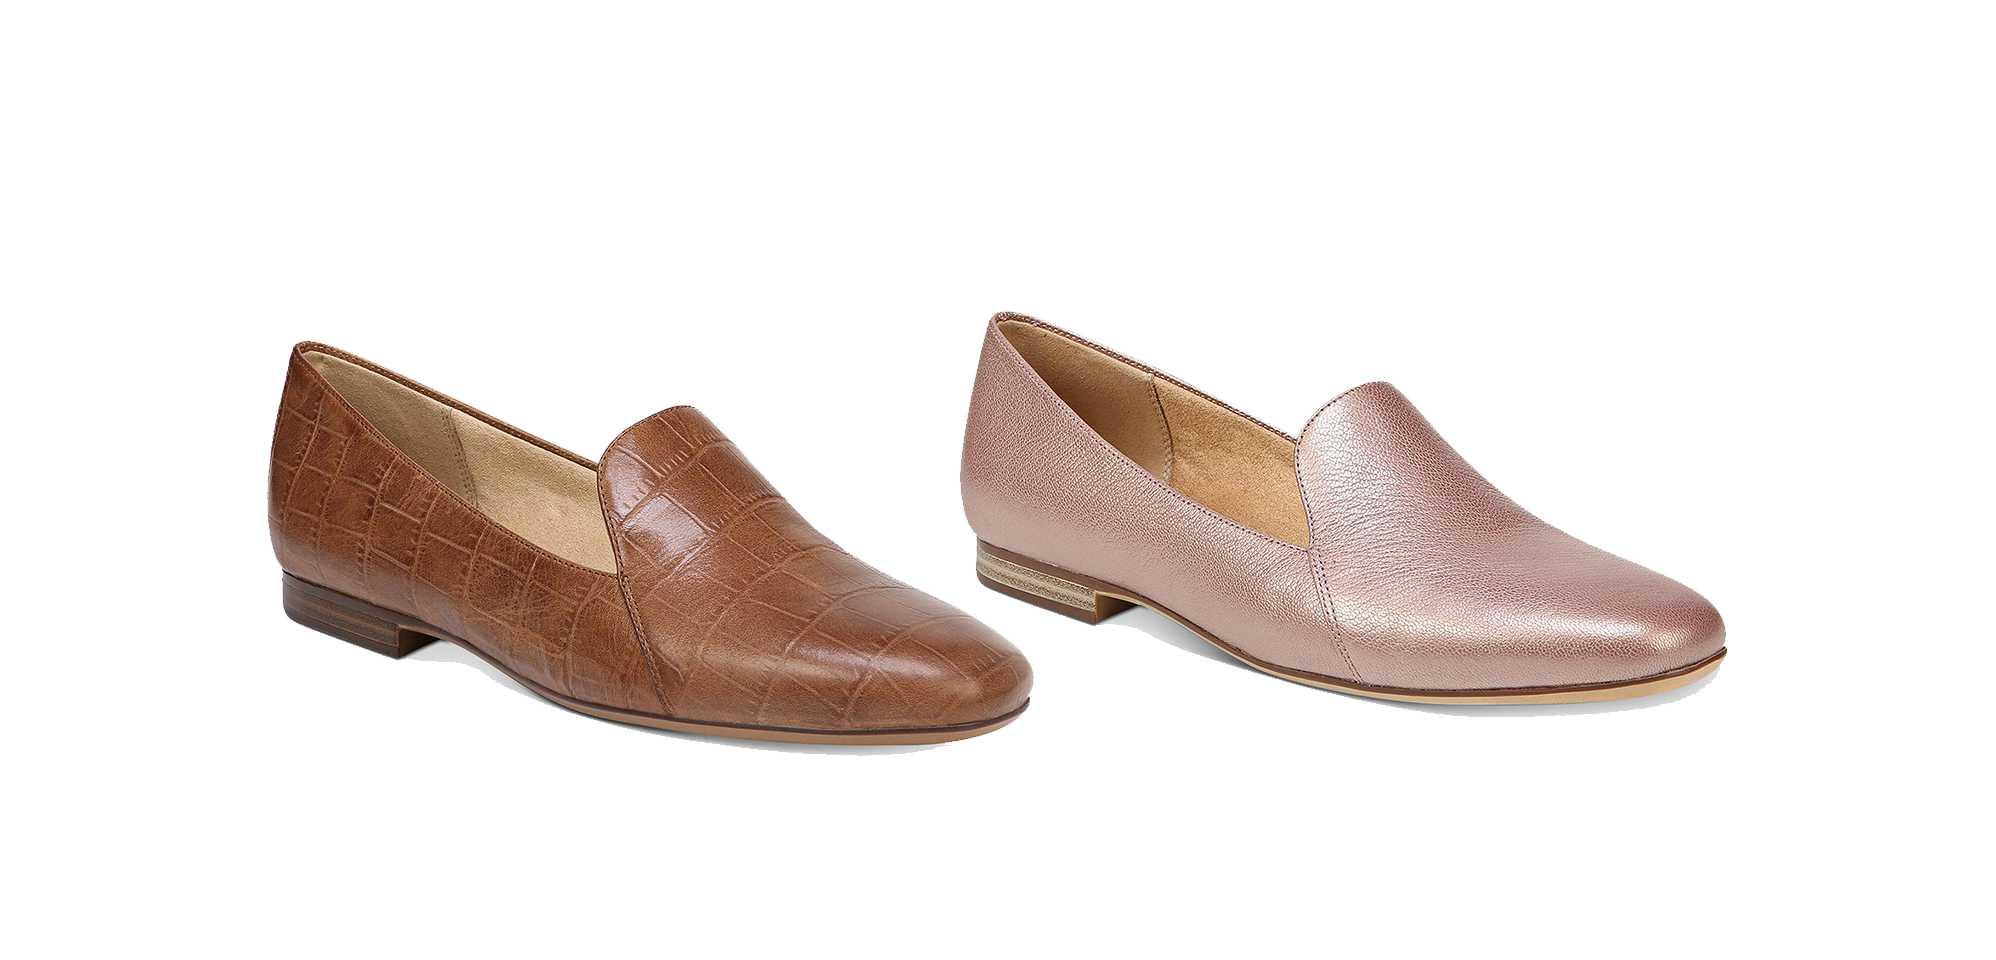 Pregnancy Shoes - Macy's